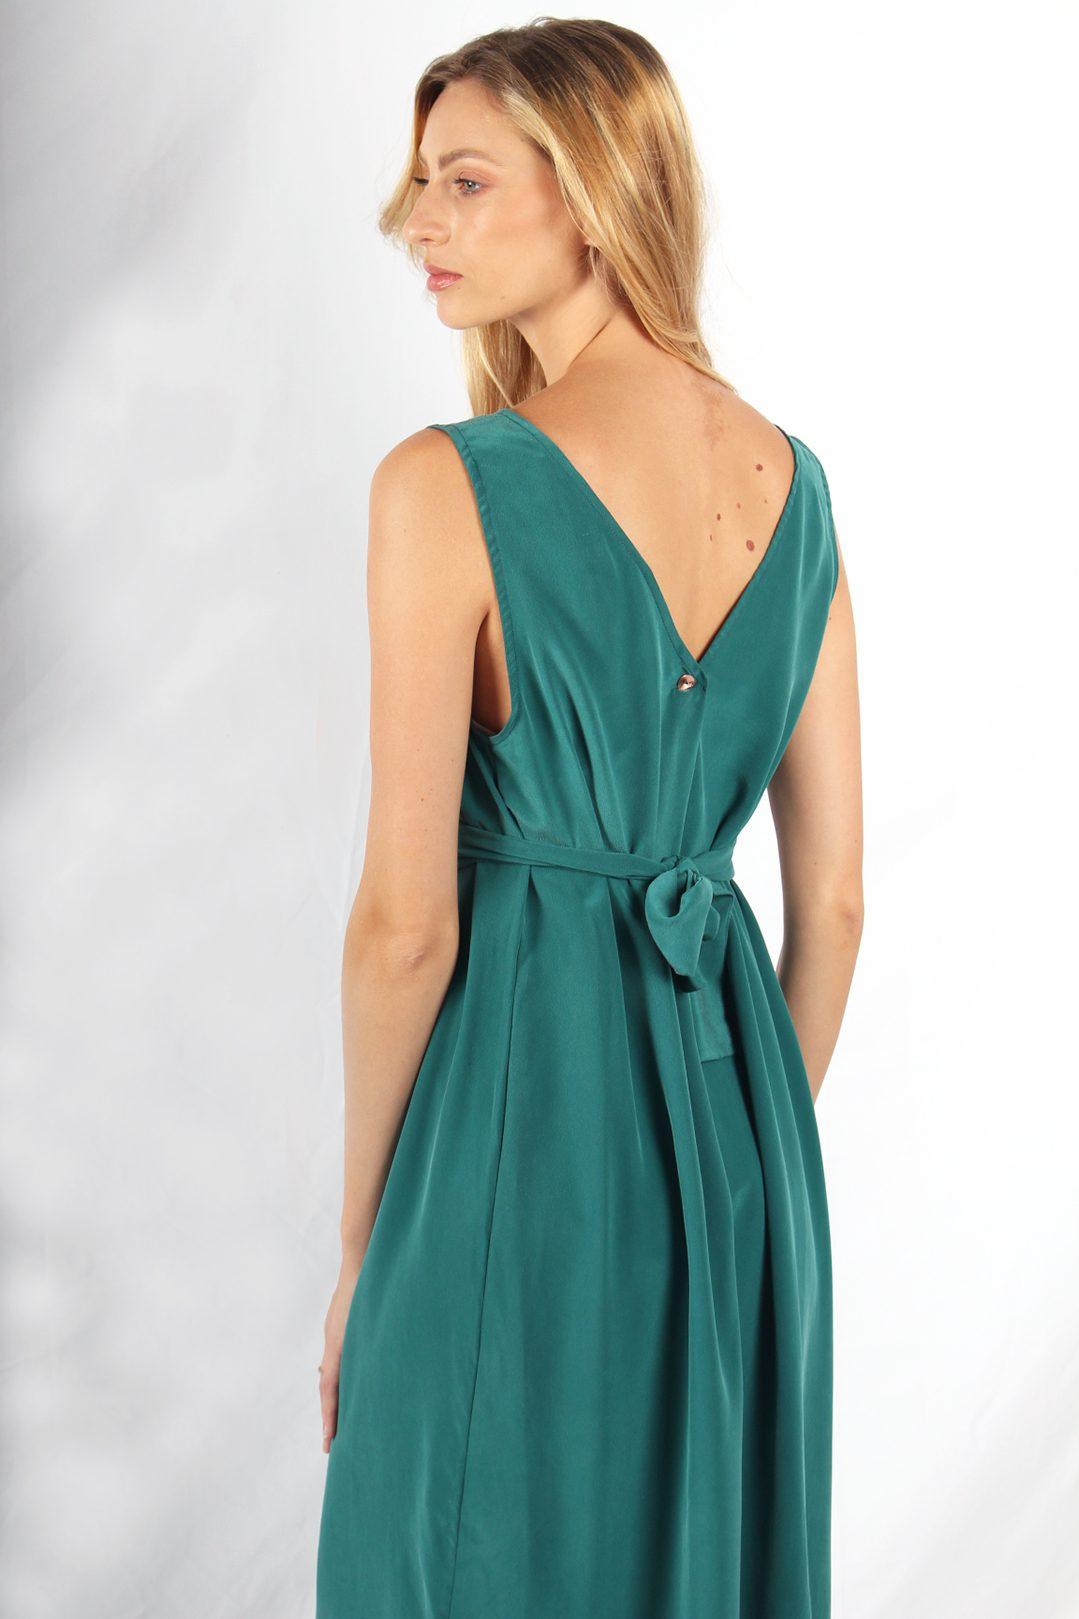 robe longue en soie verte7